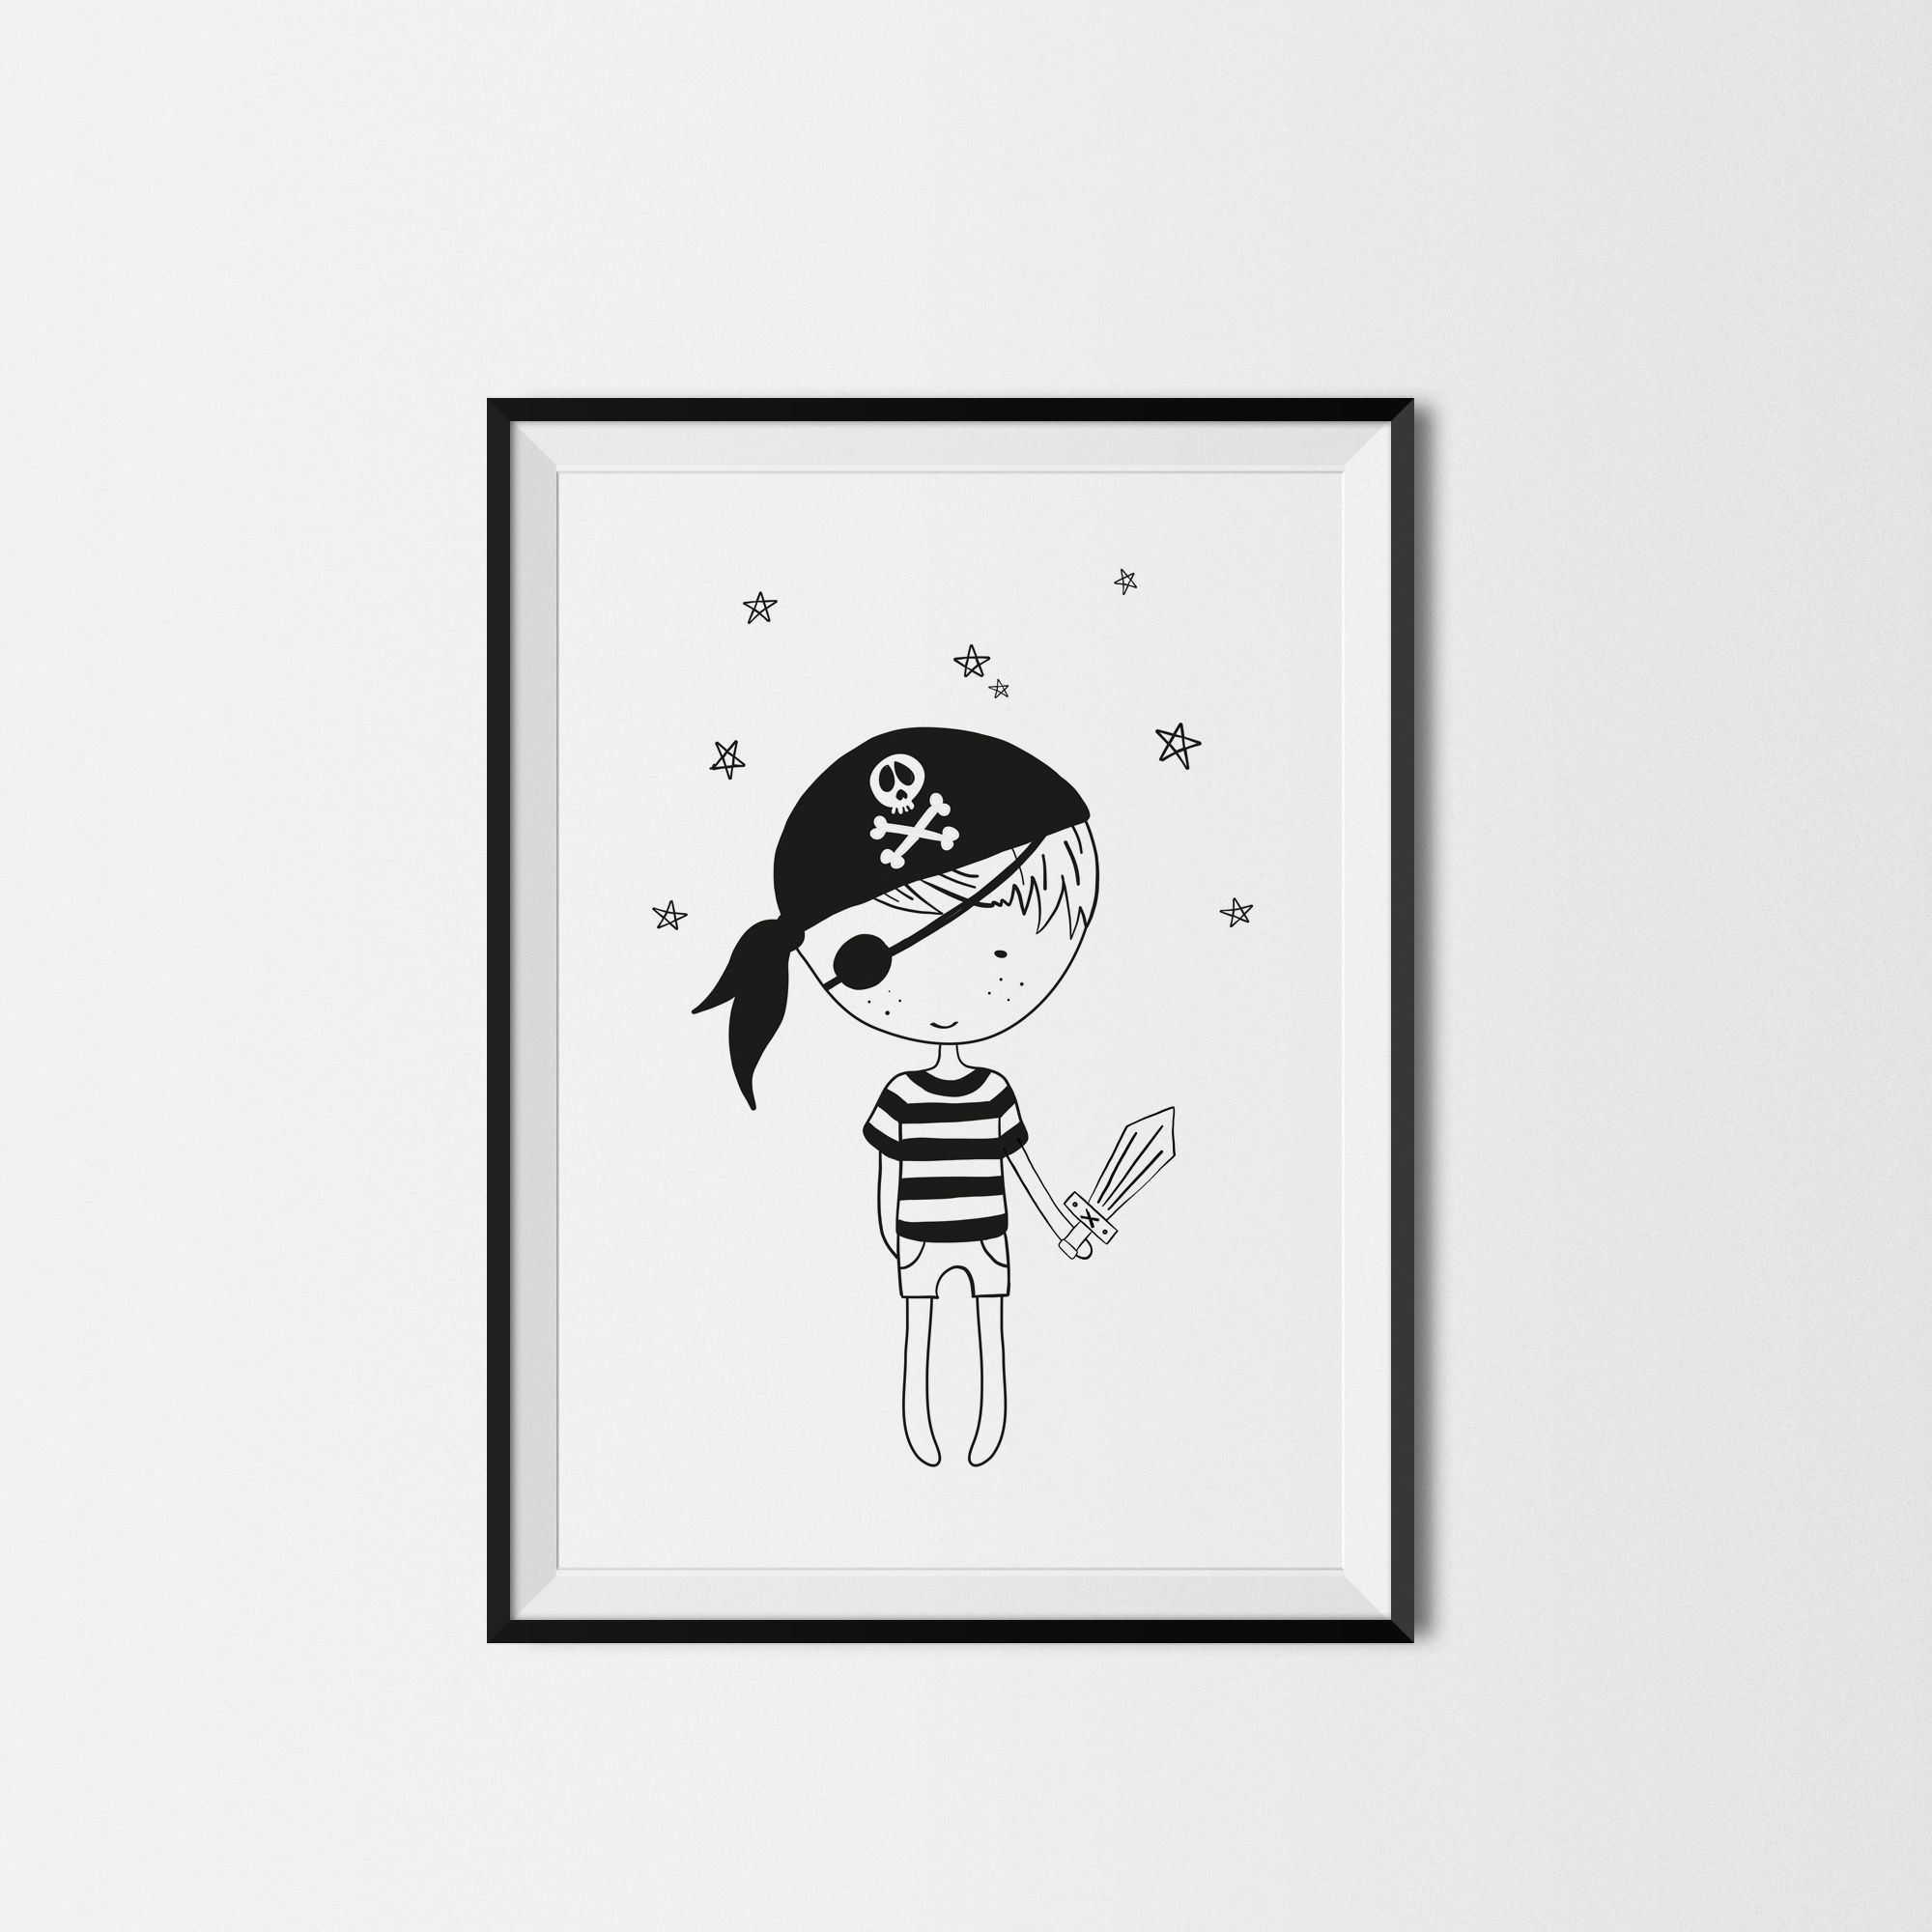 Pirate printed poster kids room wall decor monochrome print black white